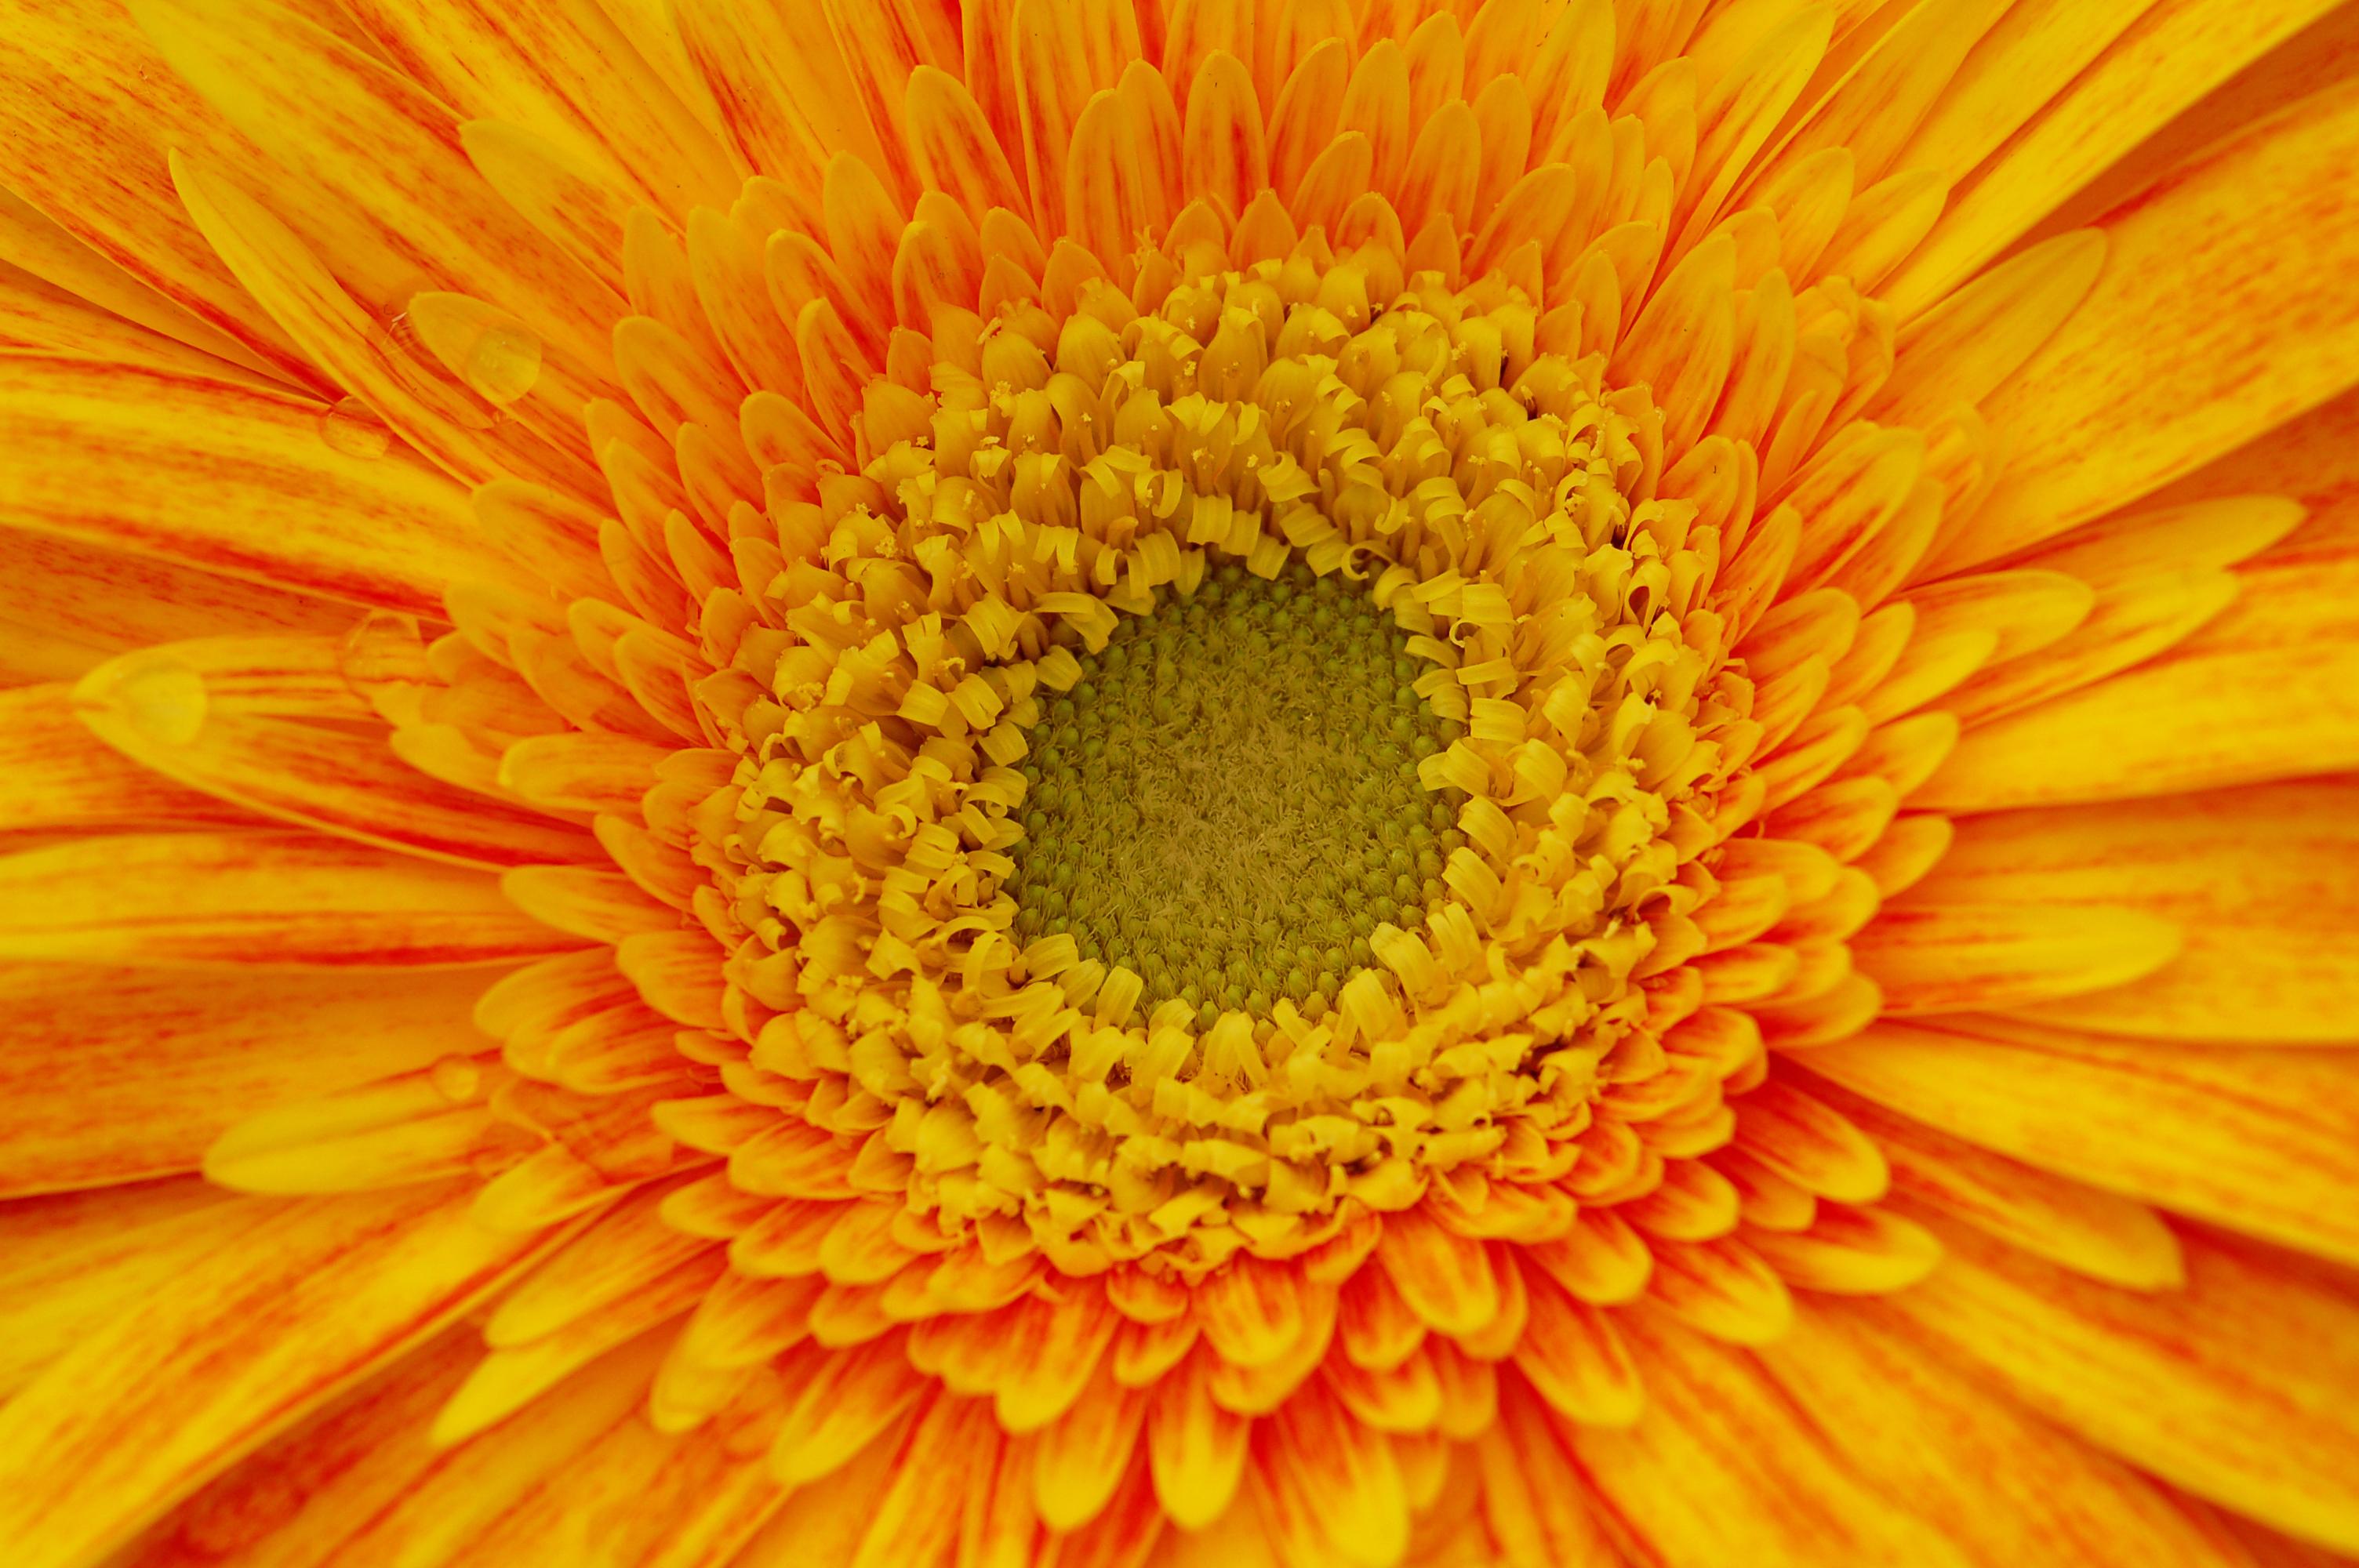 Yellow and orange gerbera daisy flower design bundles yellow and orange gerbera daisy flower nature background example image 5 izmirmasajfo